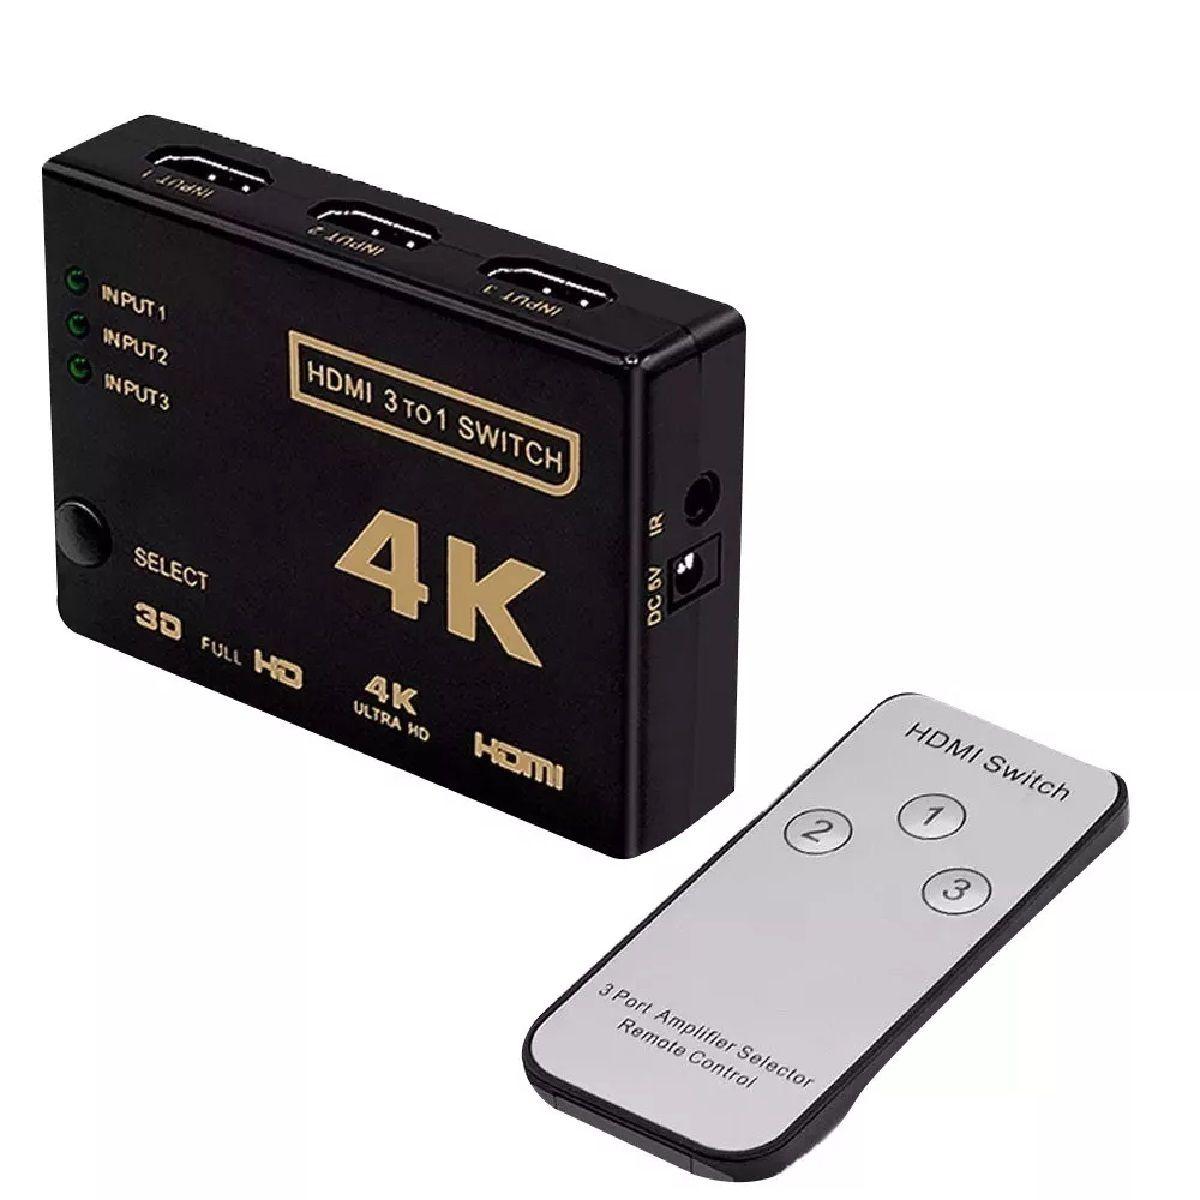 Switch 4K HDMI 3 Entradas 1 Saida C/CONTROLE Remoto  - Sarcompy